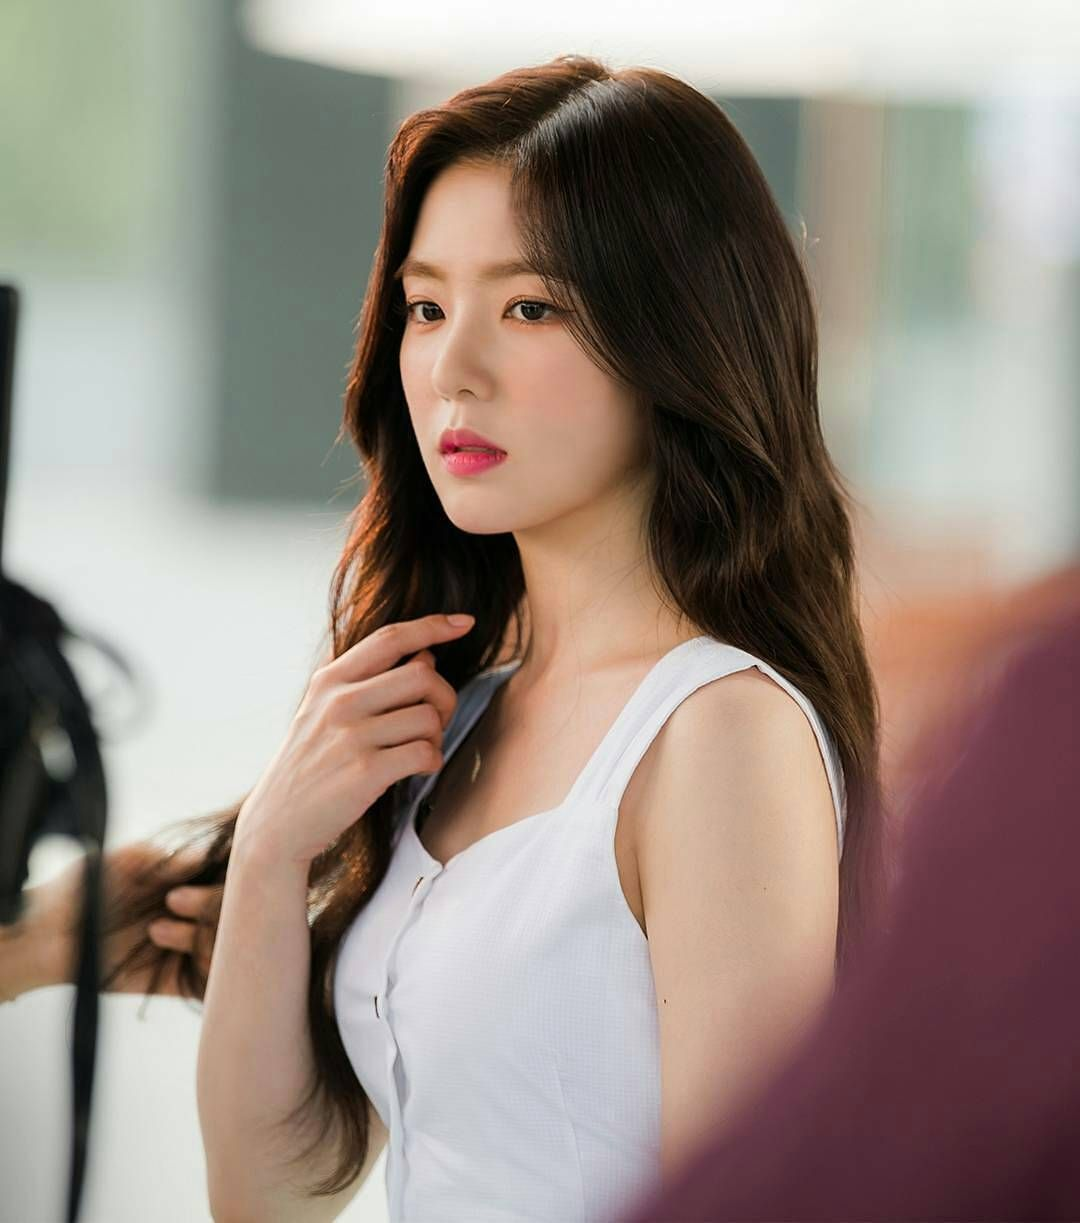 Irene14